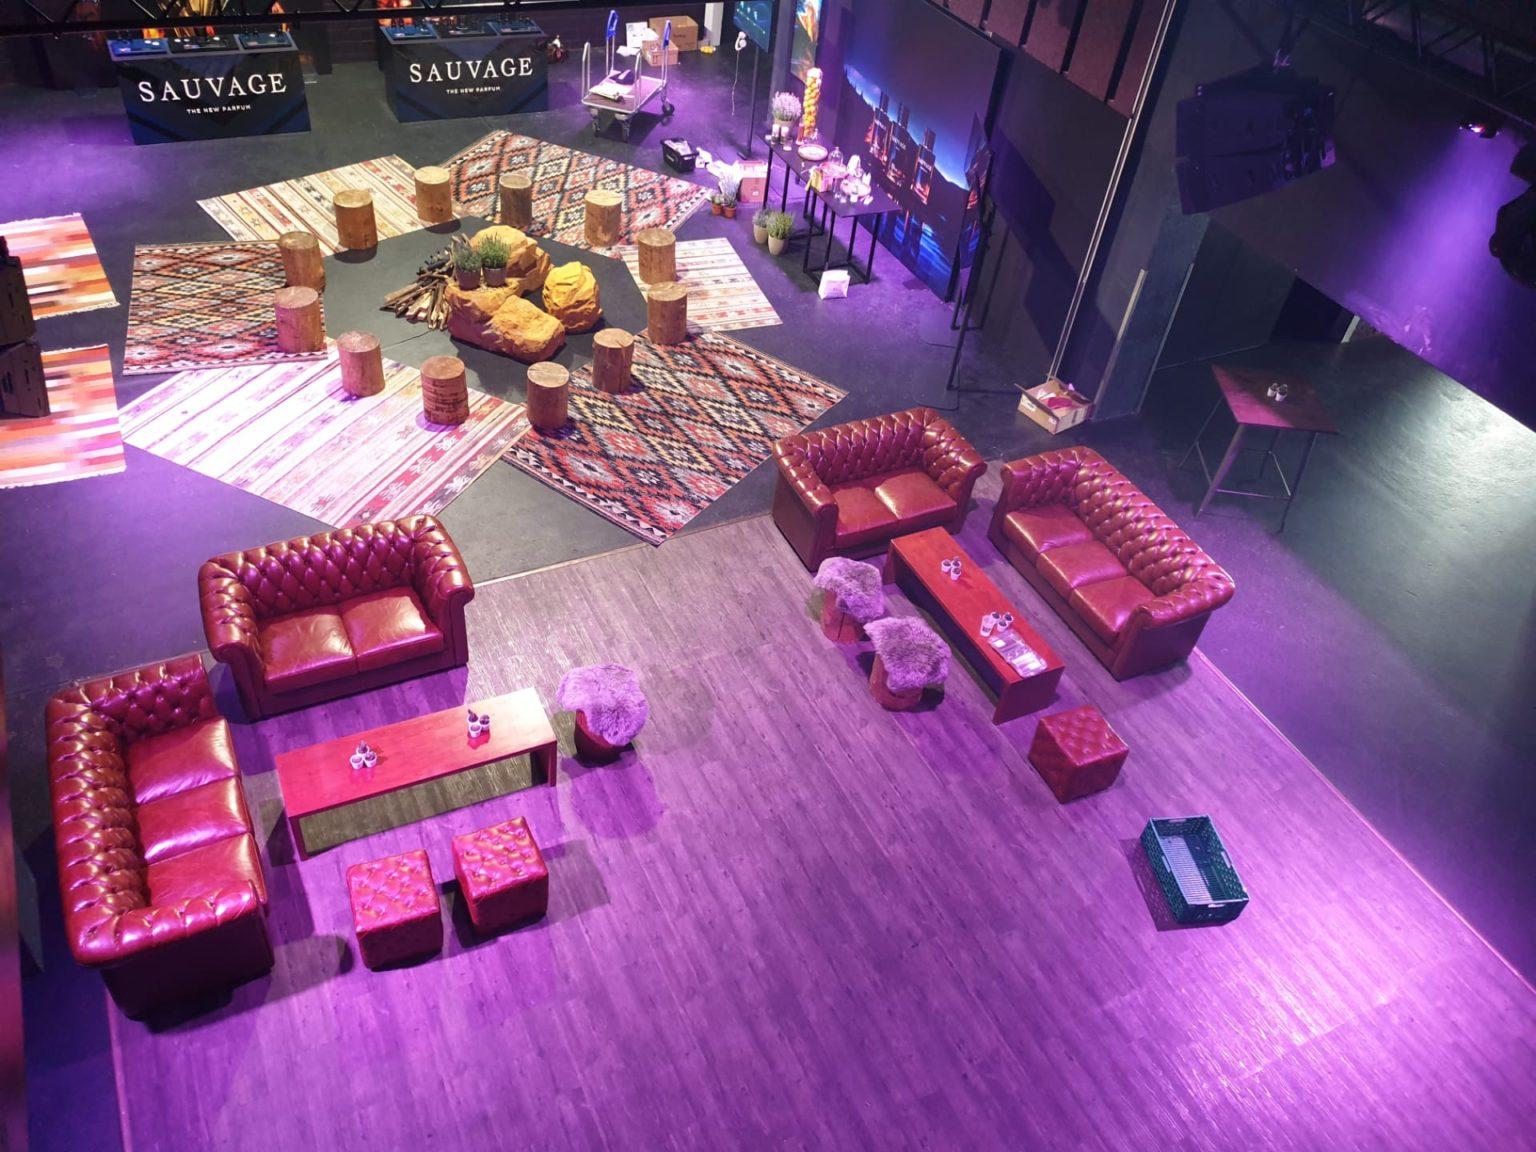 chesterfield english 3er sofa mieten rent-a-lounge 4